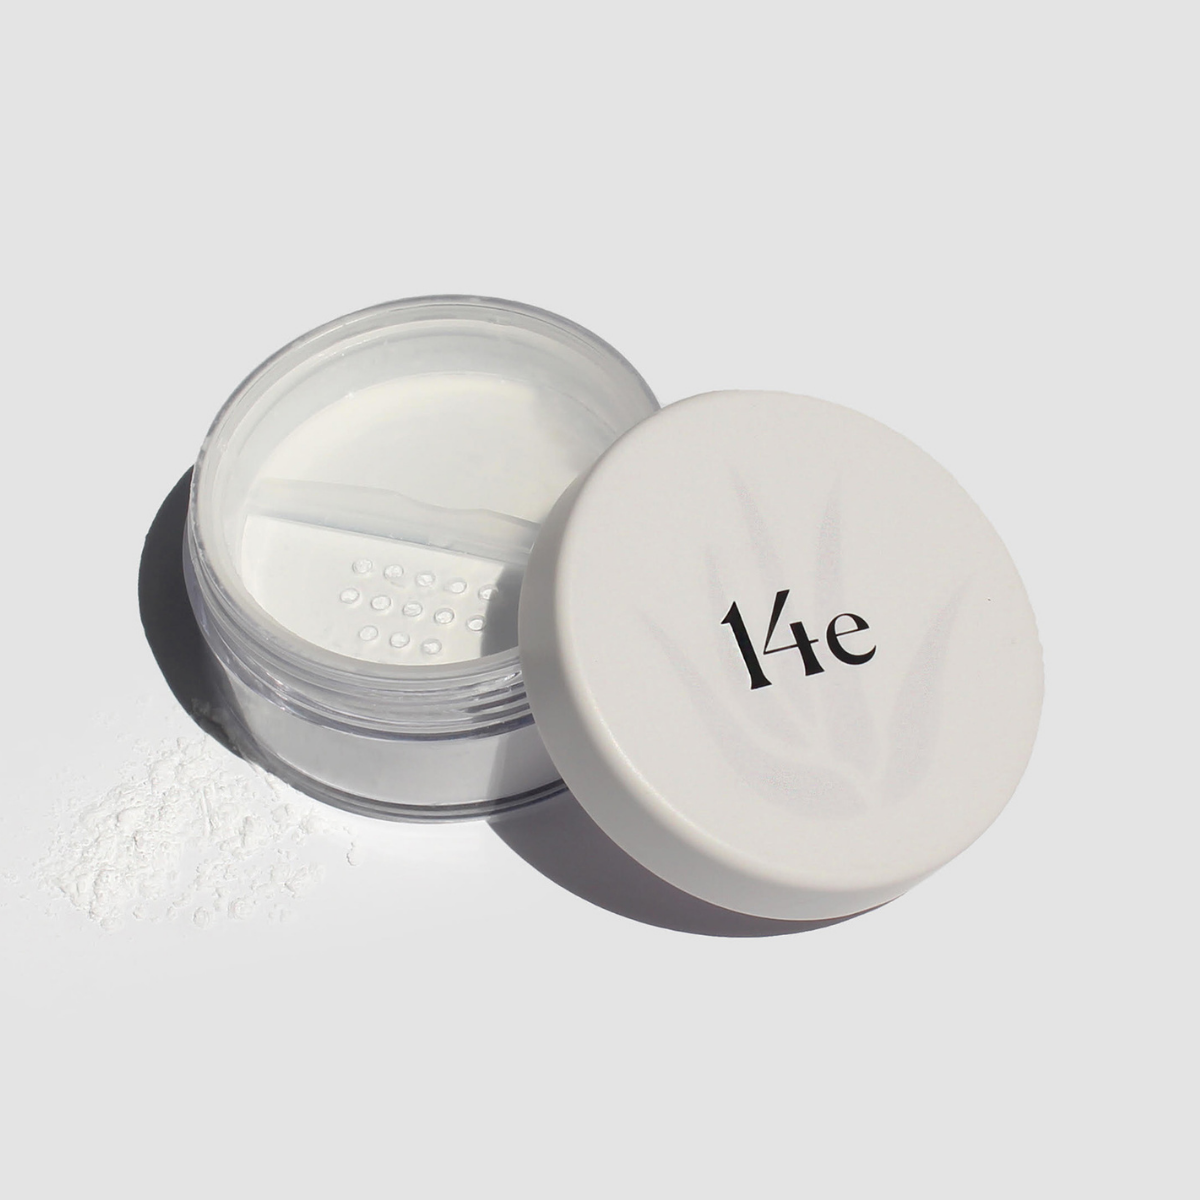 Aloe Nourish Prime + Set Powder